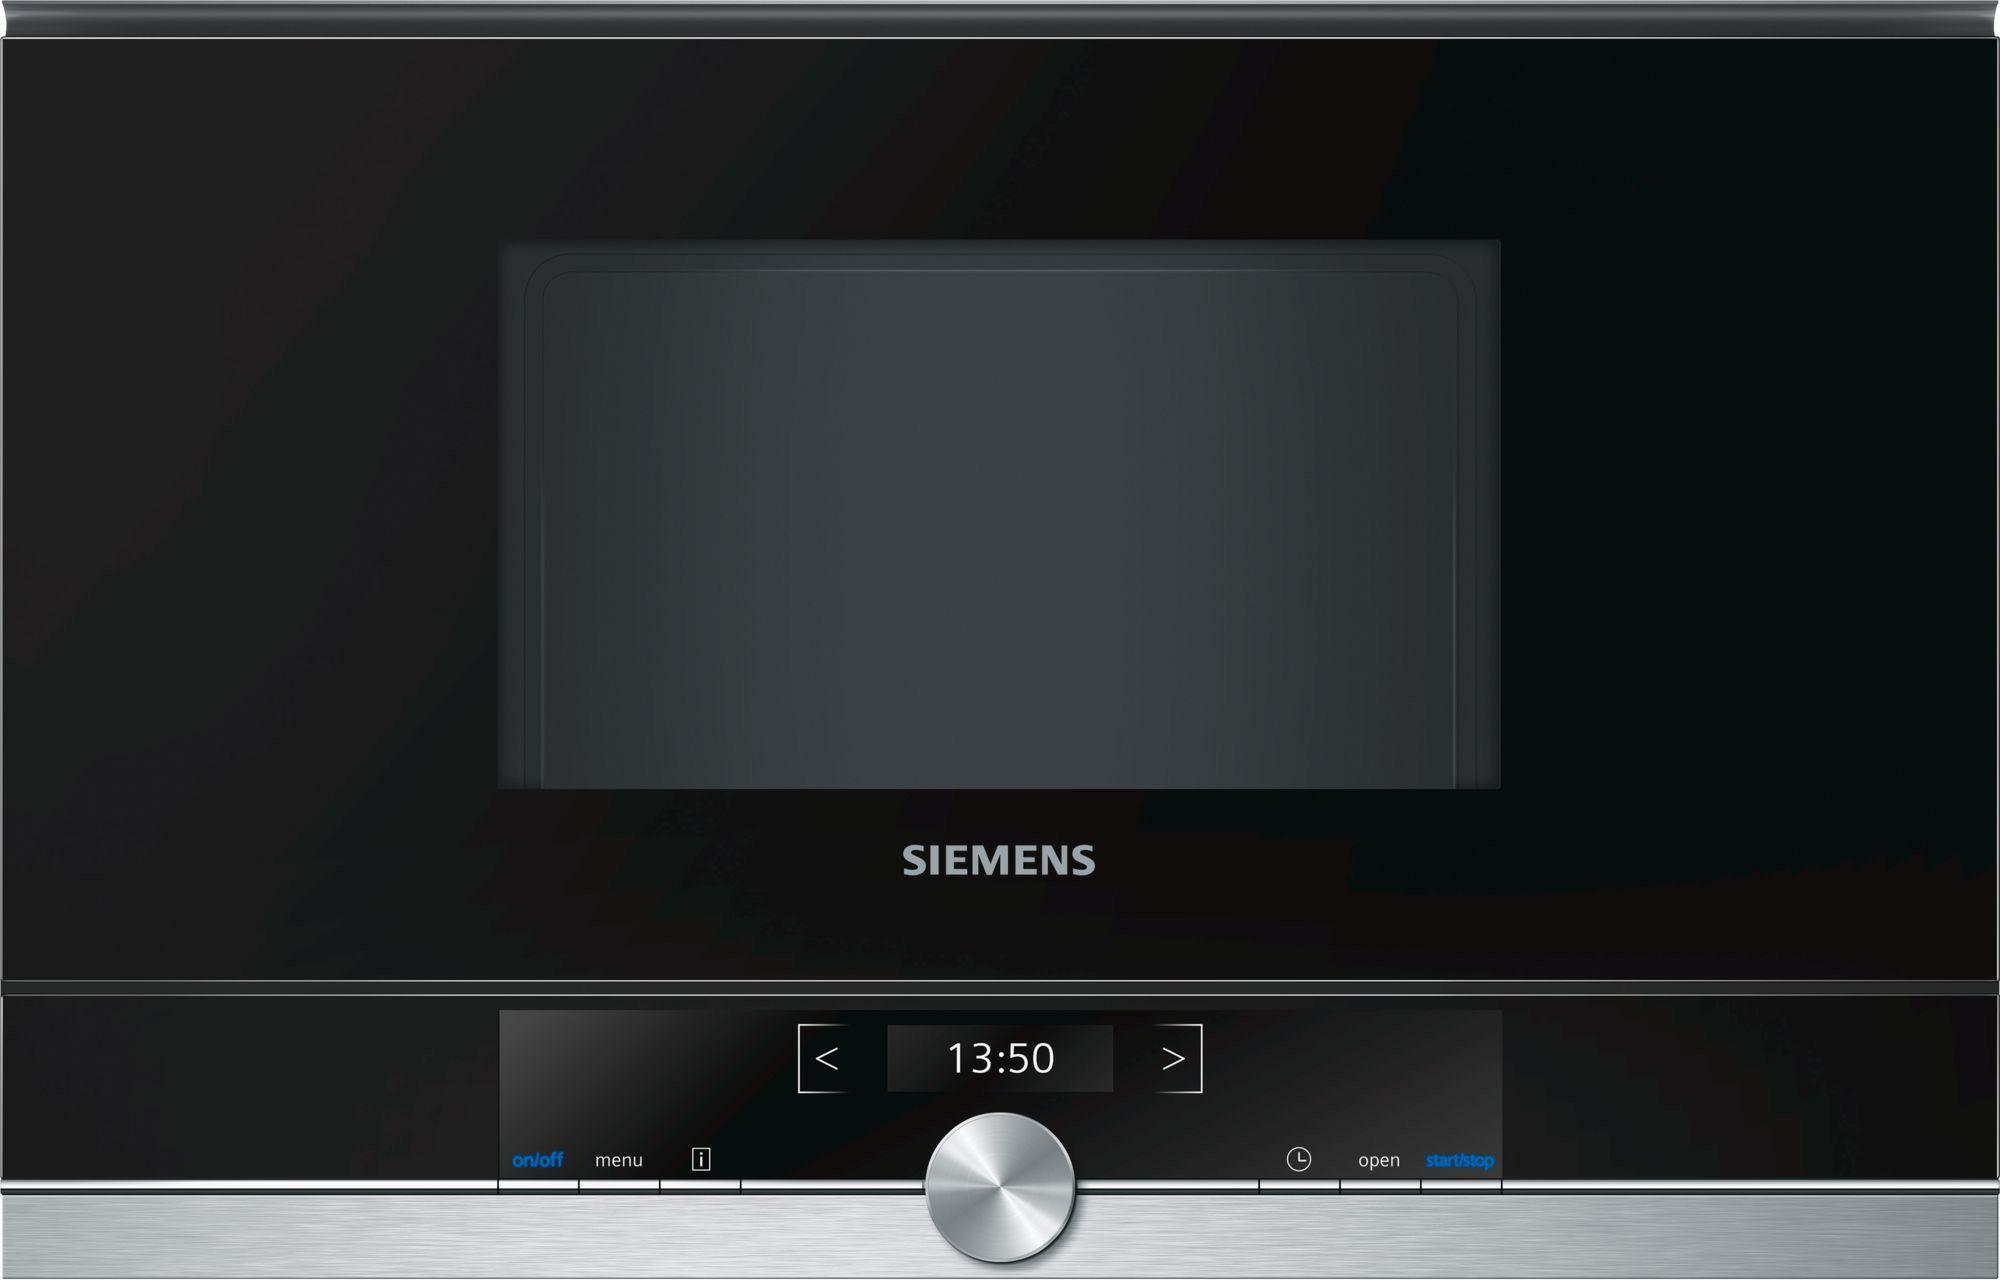 microgolfoven enkel microgolven (inbouw) Siemens BF634LGS1 microgolfoven enkel microgolven (inbouw) BF 634LGS1 BF 634 LGS 1